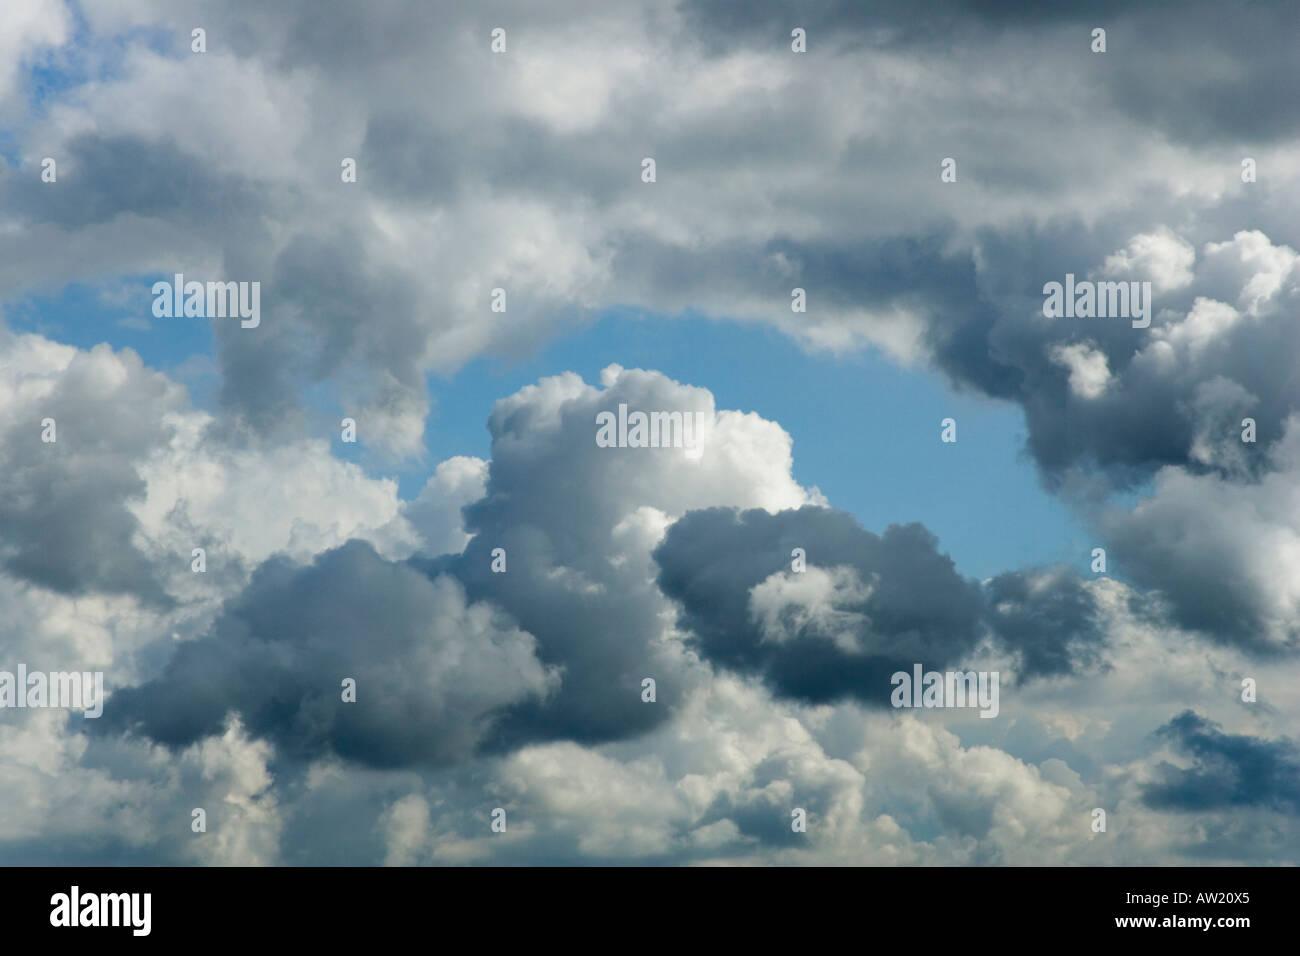 Minatory clouds - Stock Image